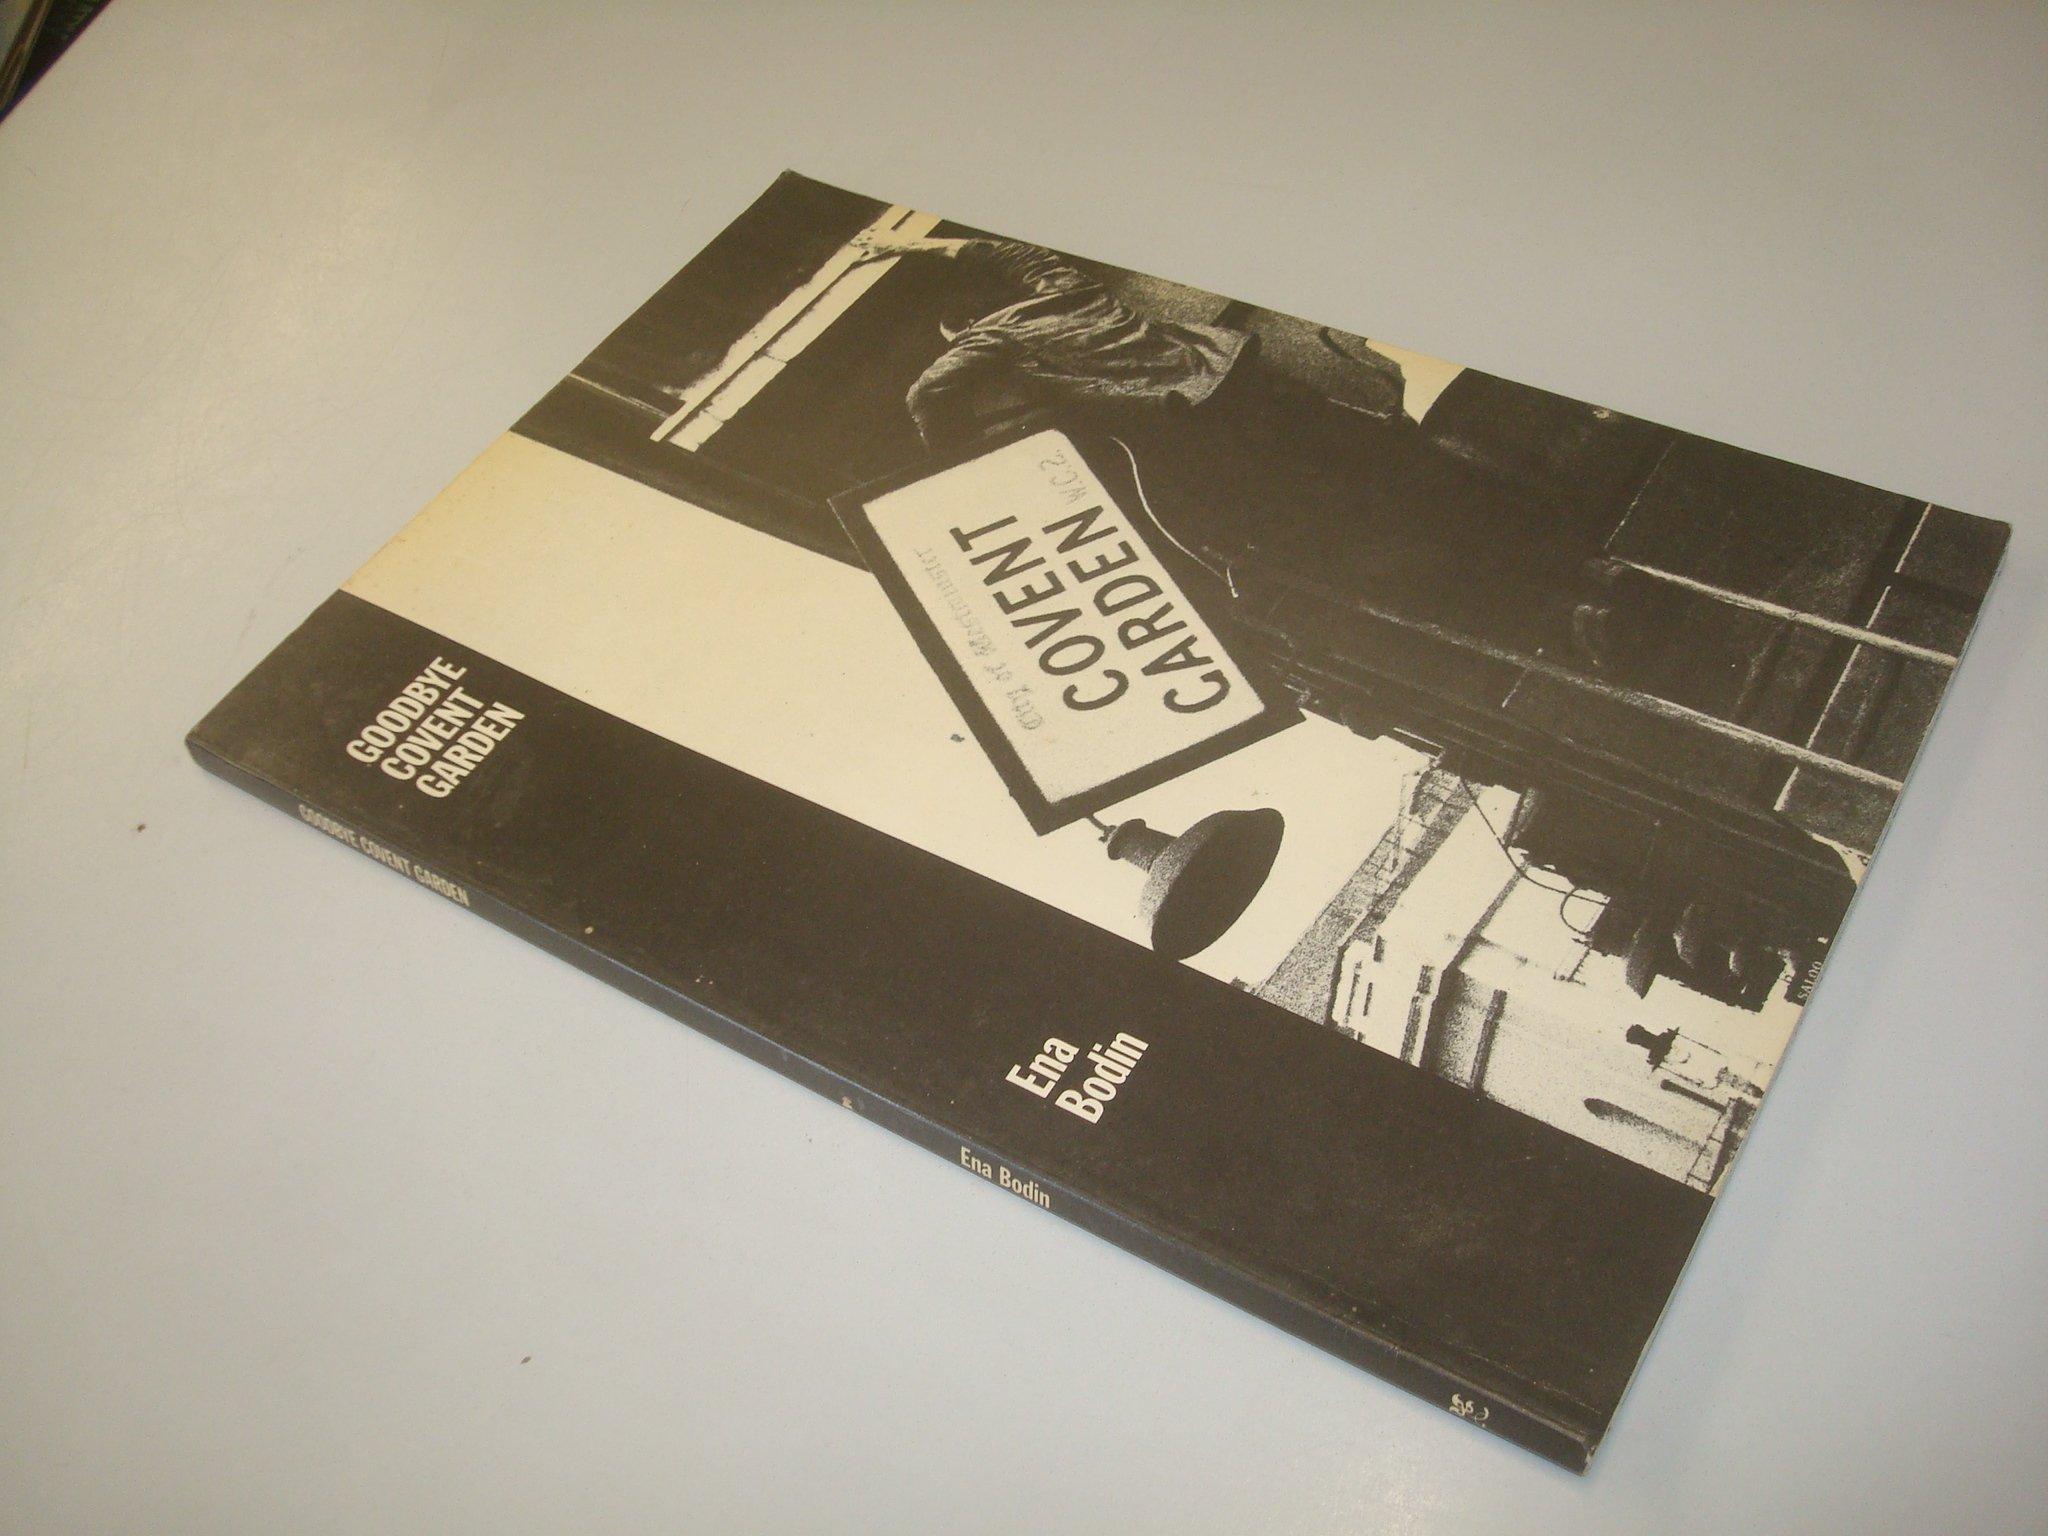 Goodbye Covent Garden: Ena Bodin: 9780902280304: Amazon.com: Books